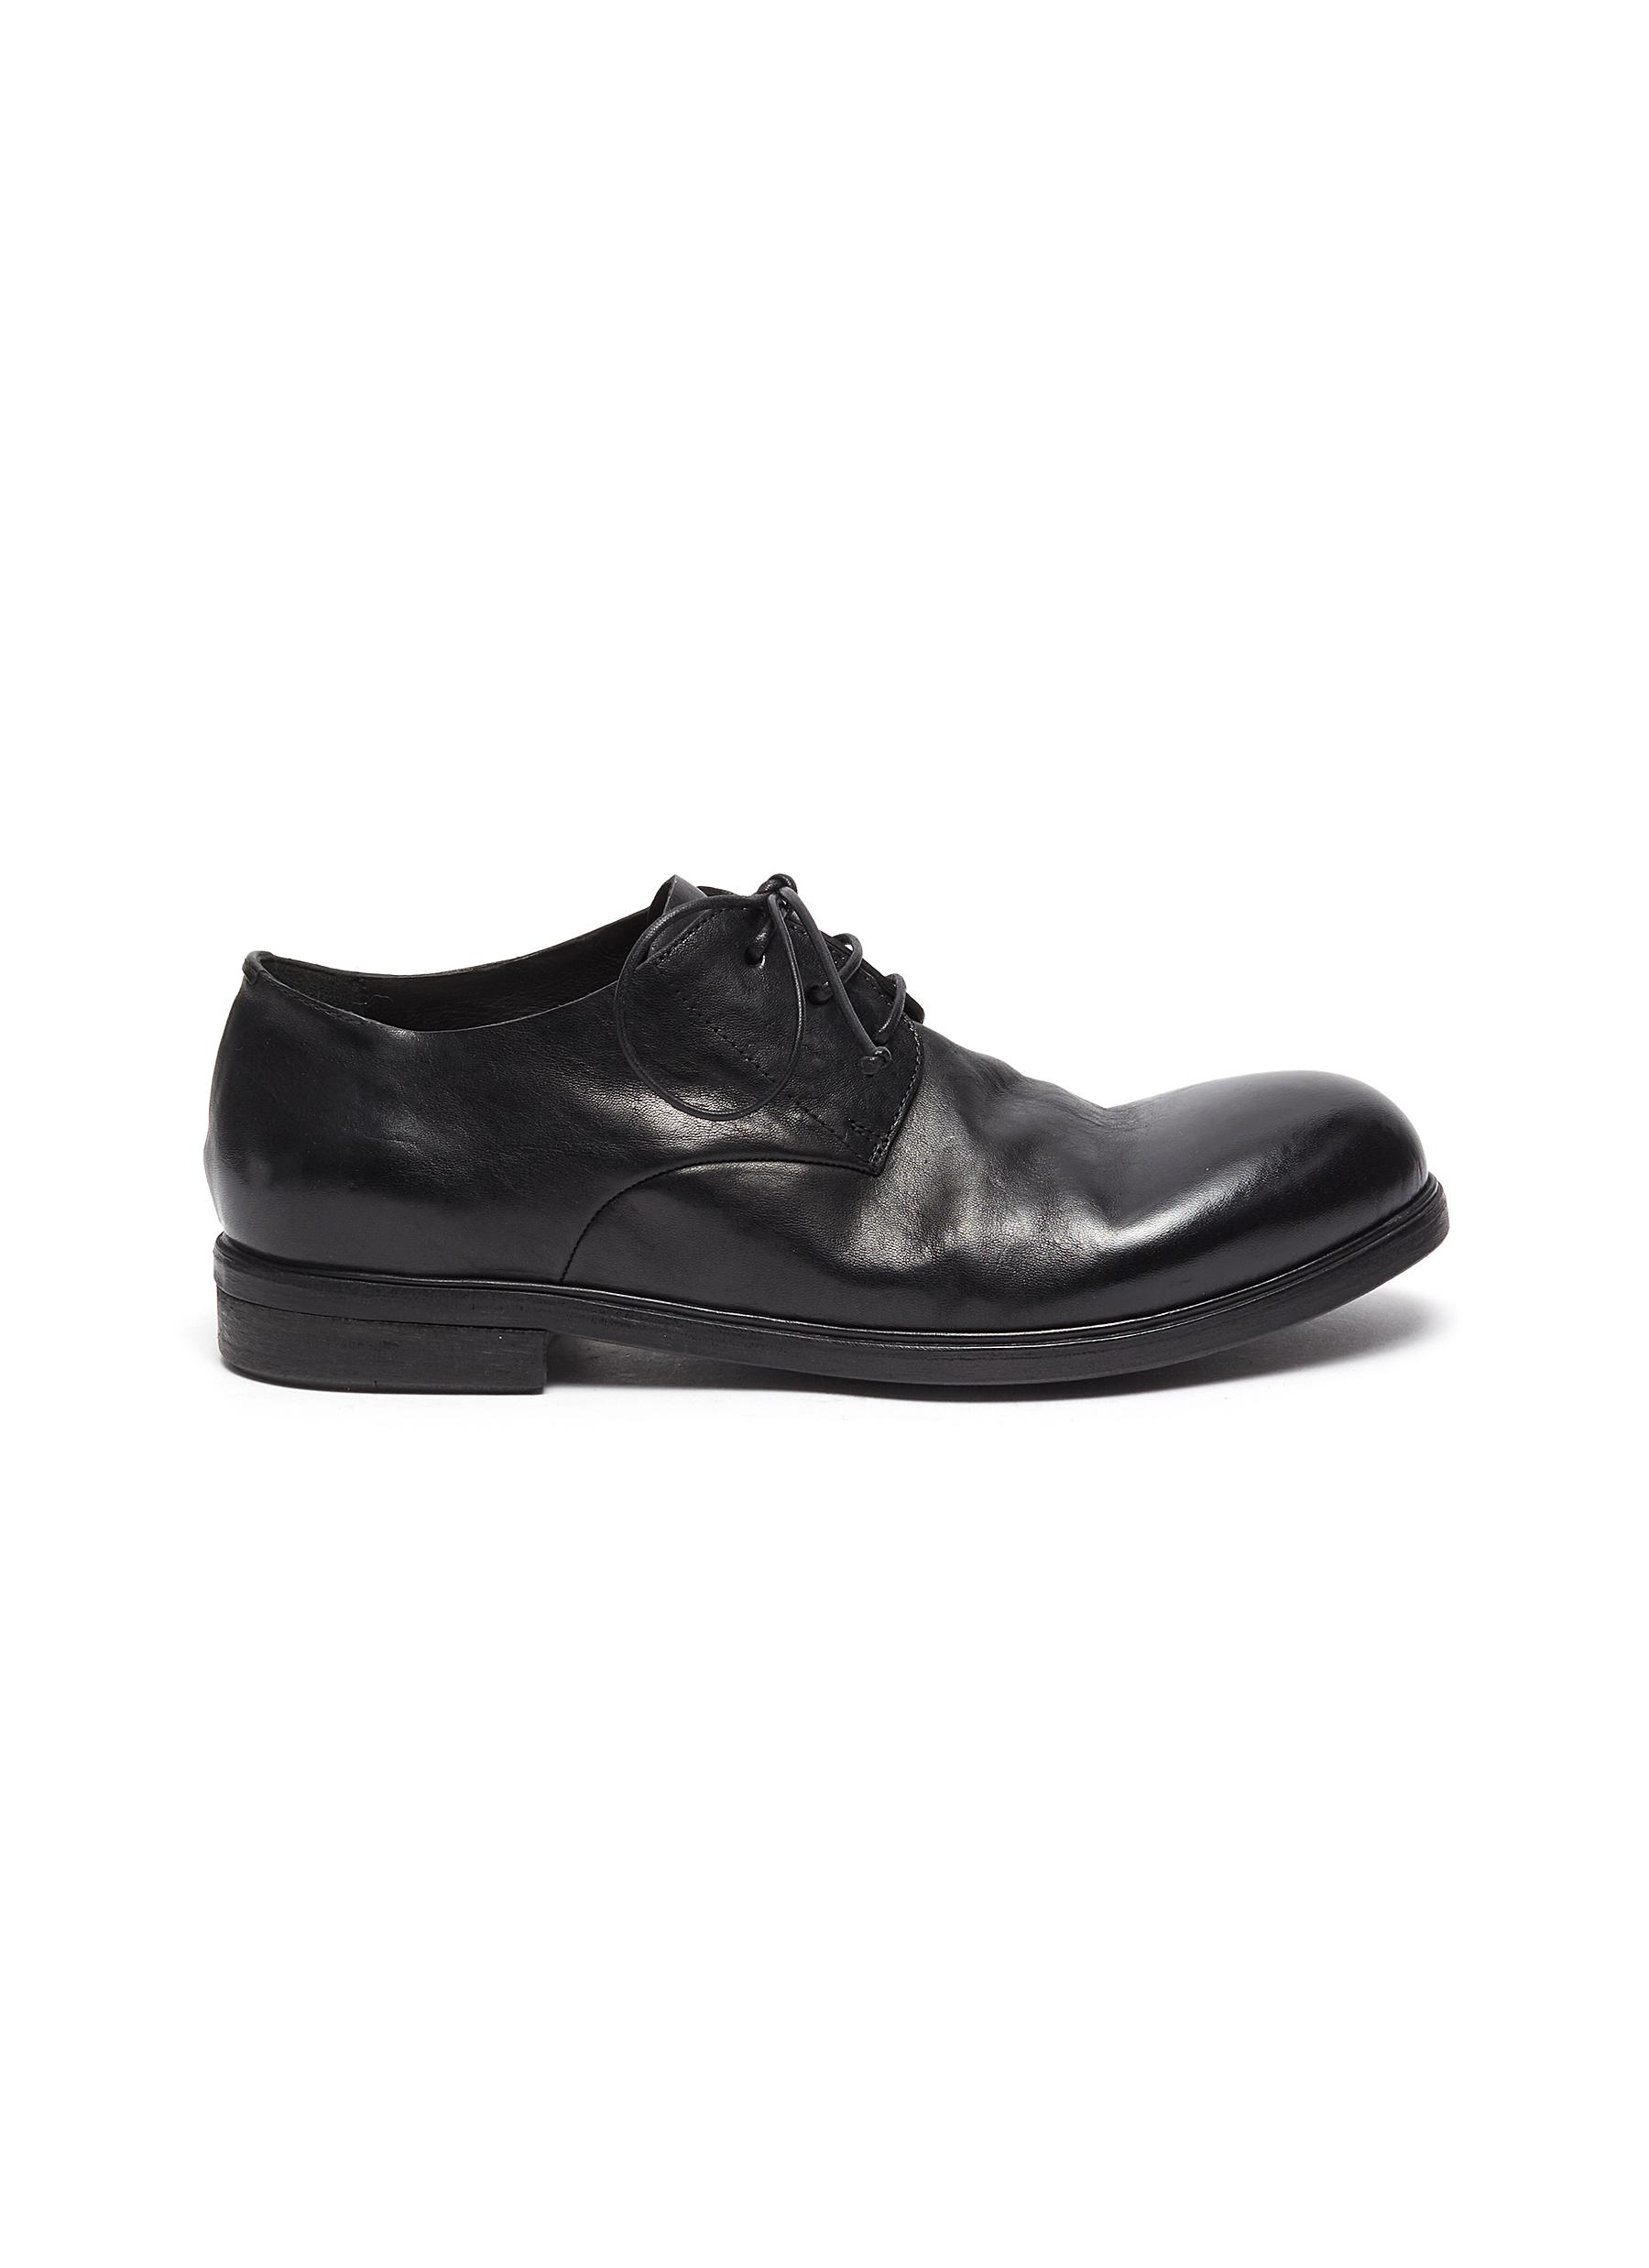 Leather derby shoes - MARSÈLL - Modalova